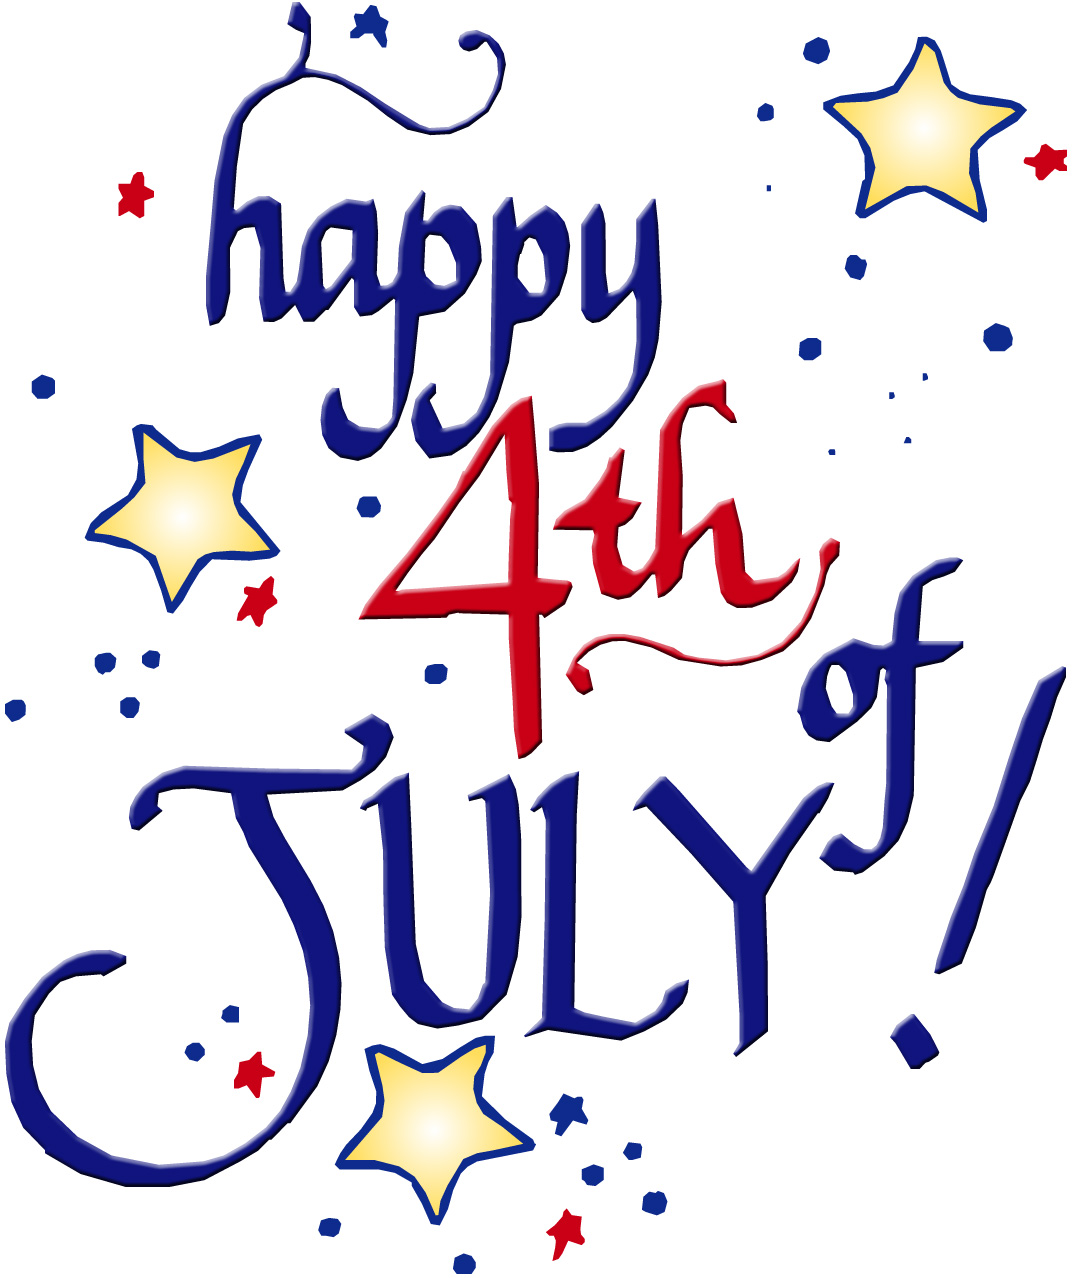 Free 4th july.